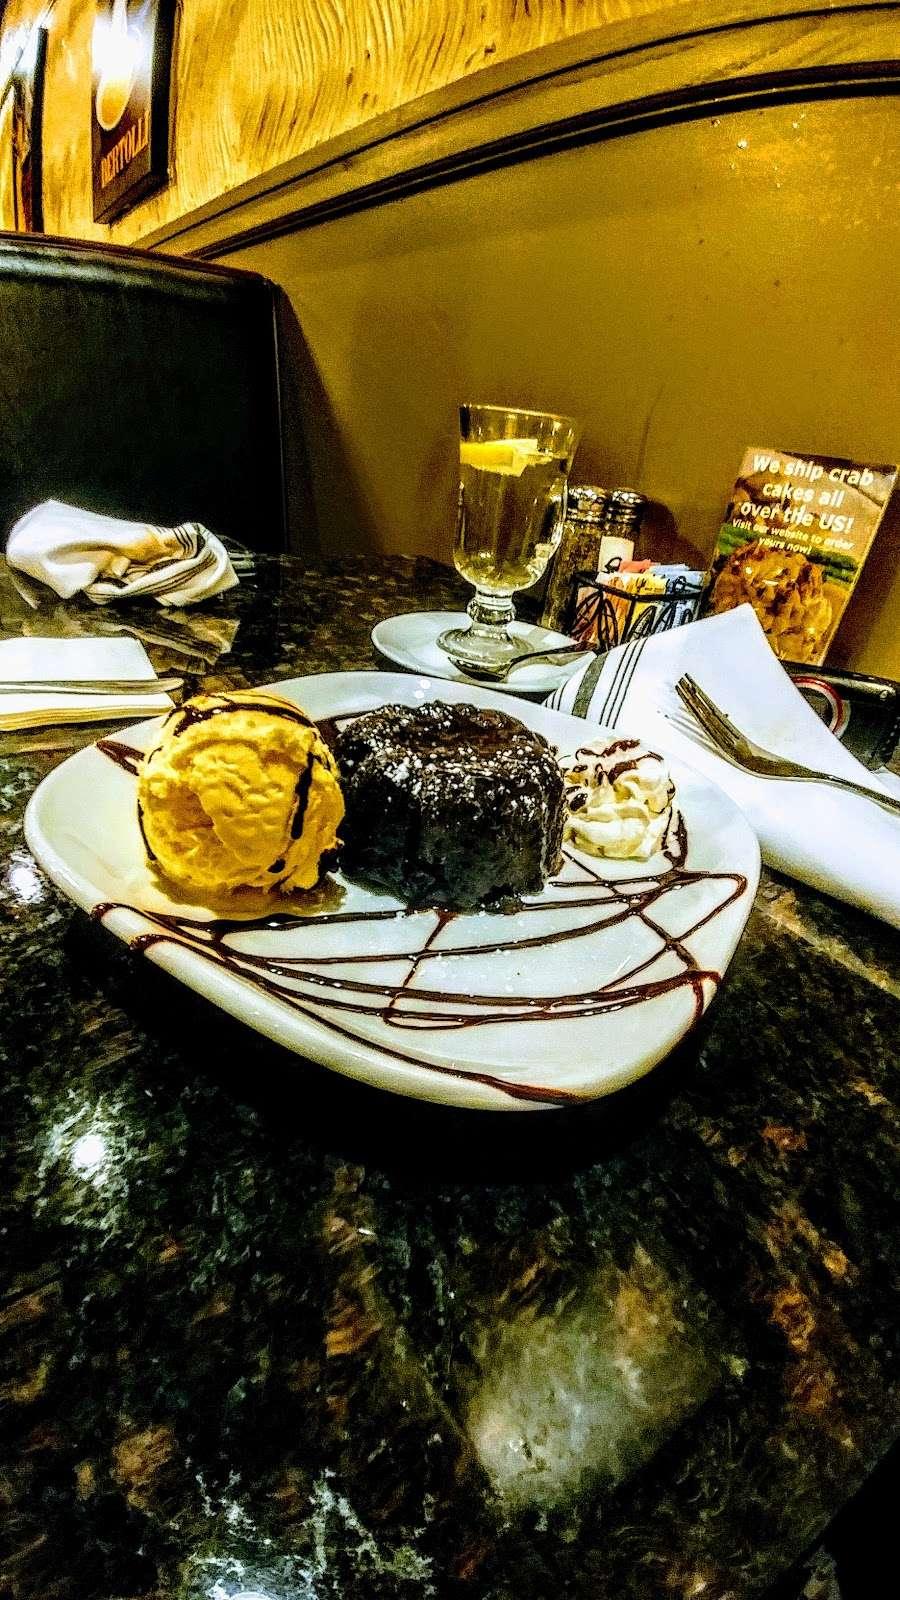 Basta Pasta - restaurant  | Photo 8 of 10 | Address: 2745 Fallston Rd, Fallston, MD 21047, USA | Phone: (410) 692-5200